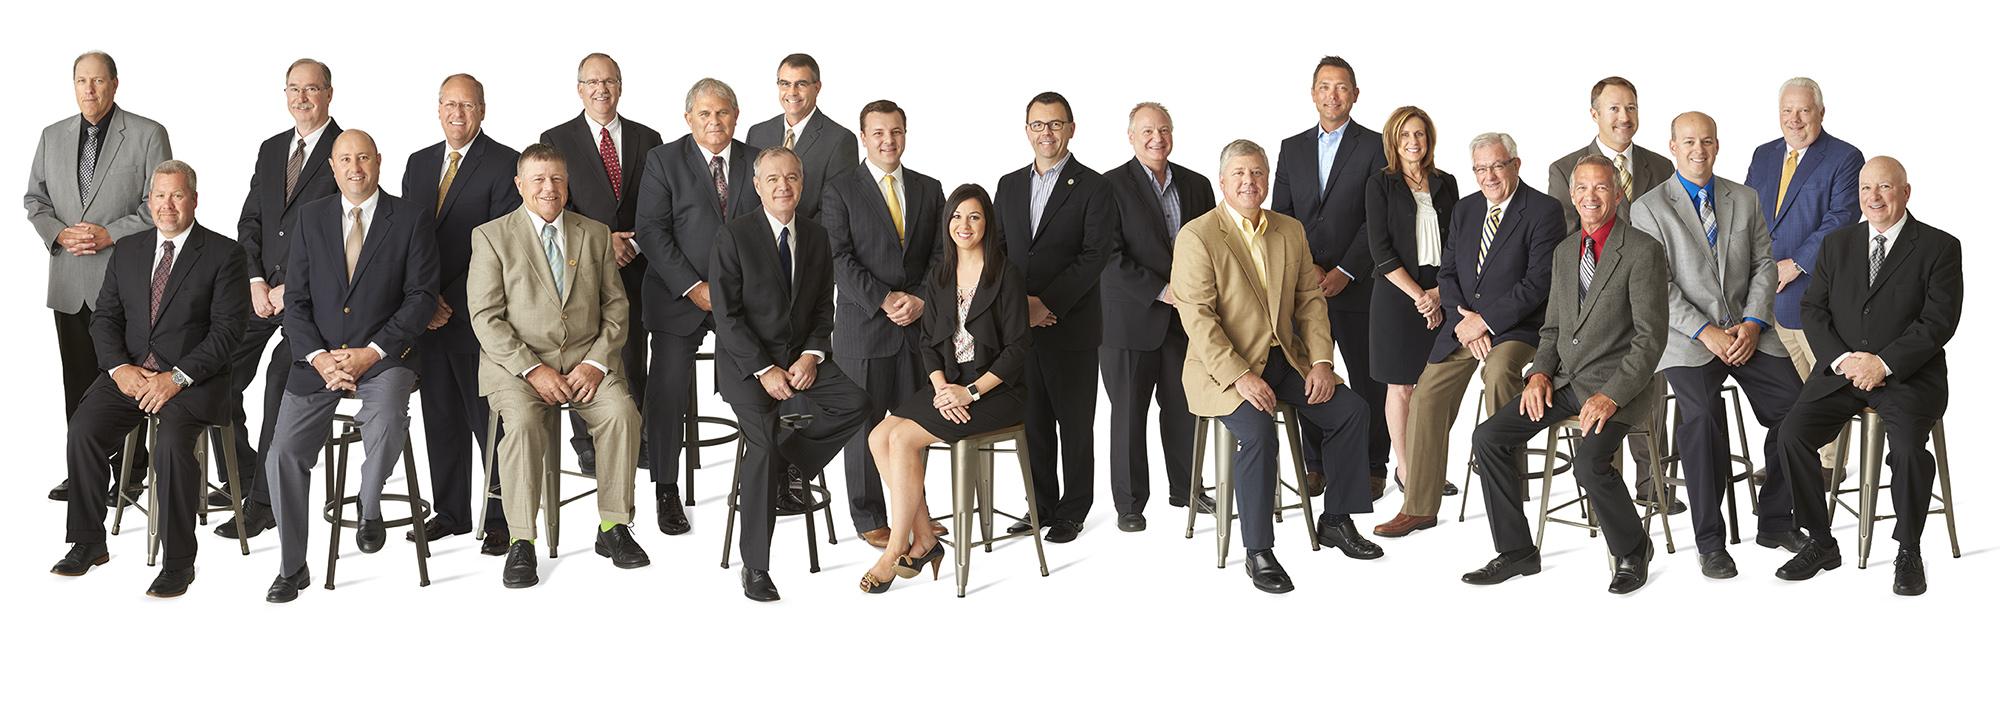 0711-CEO-Photo